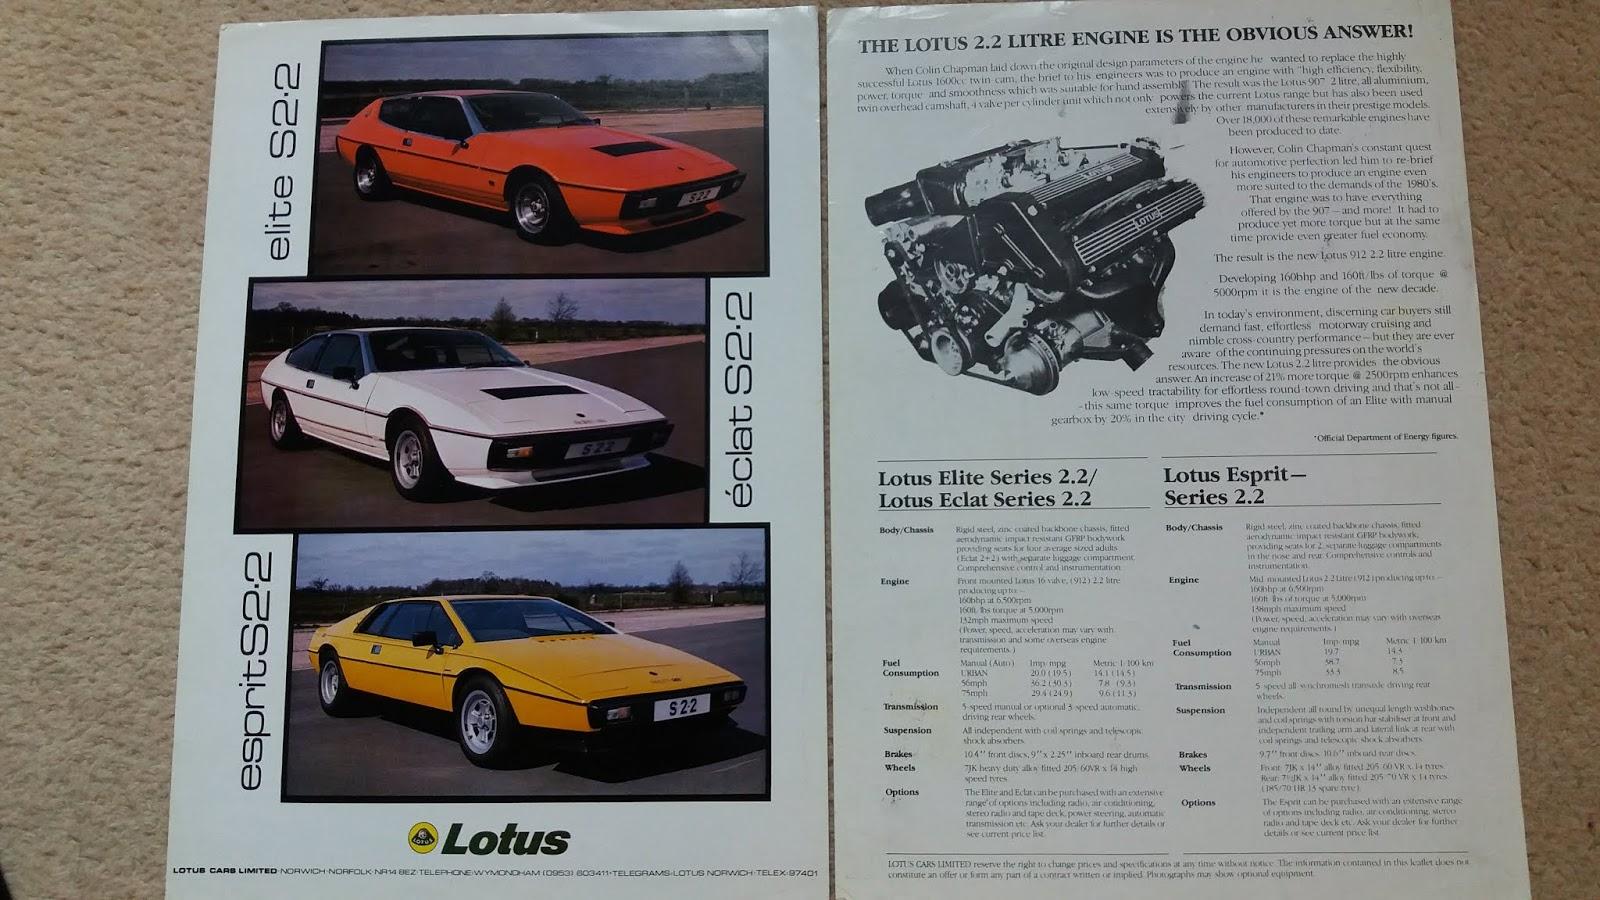 Responsible Lotus Esprit Post Card Brochure Sales Literature Vehicle Parts & Accessories Automobilia